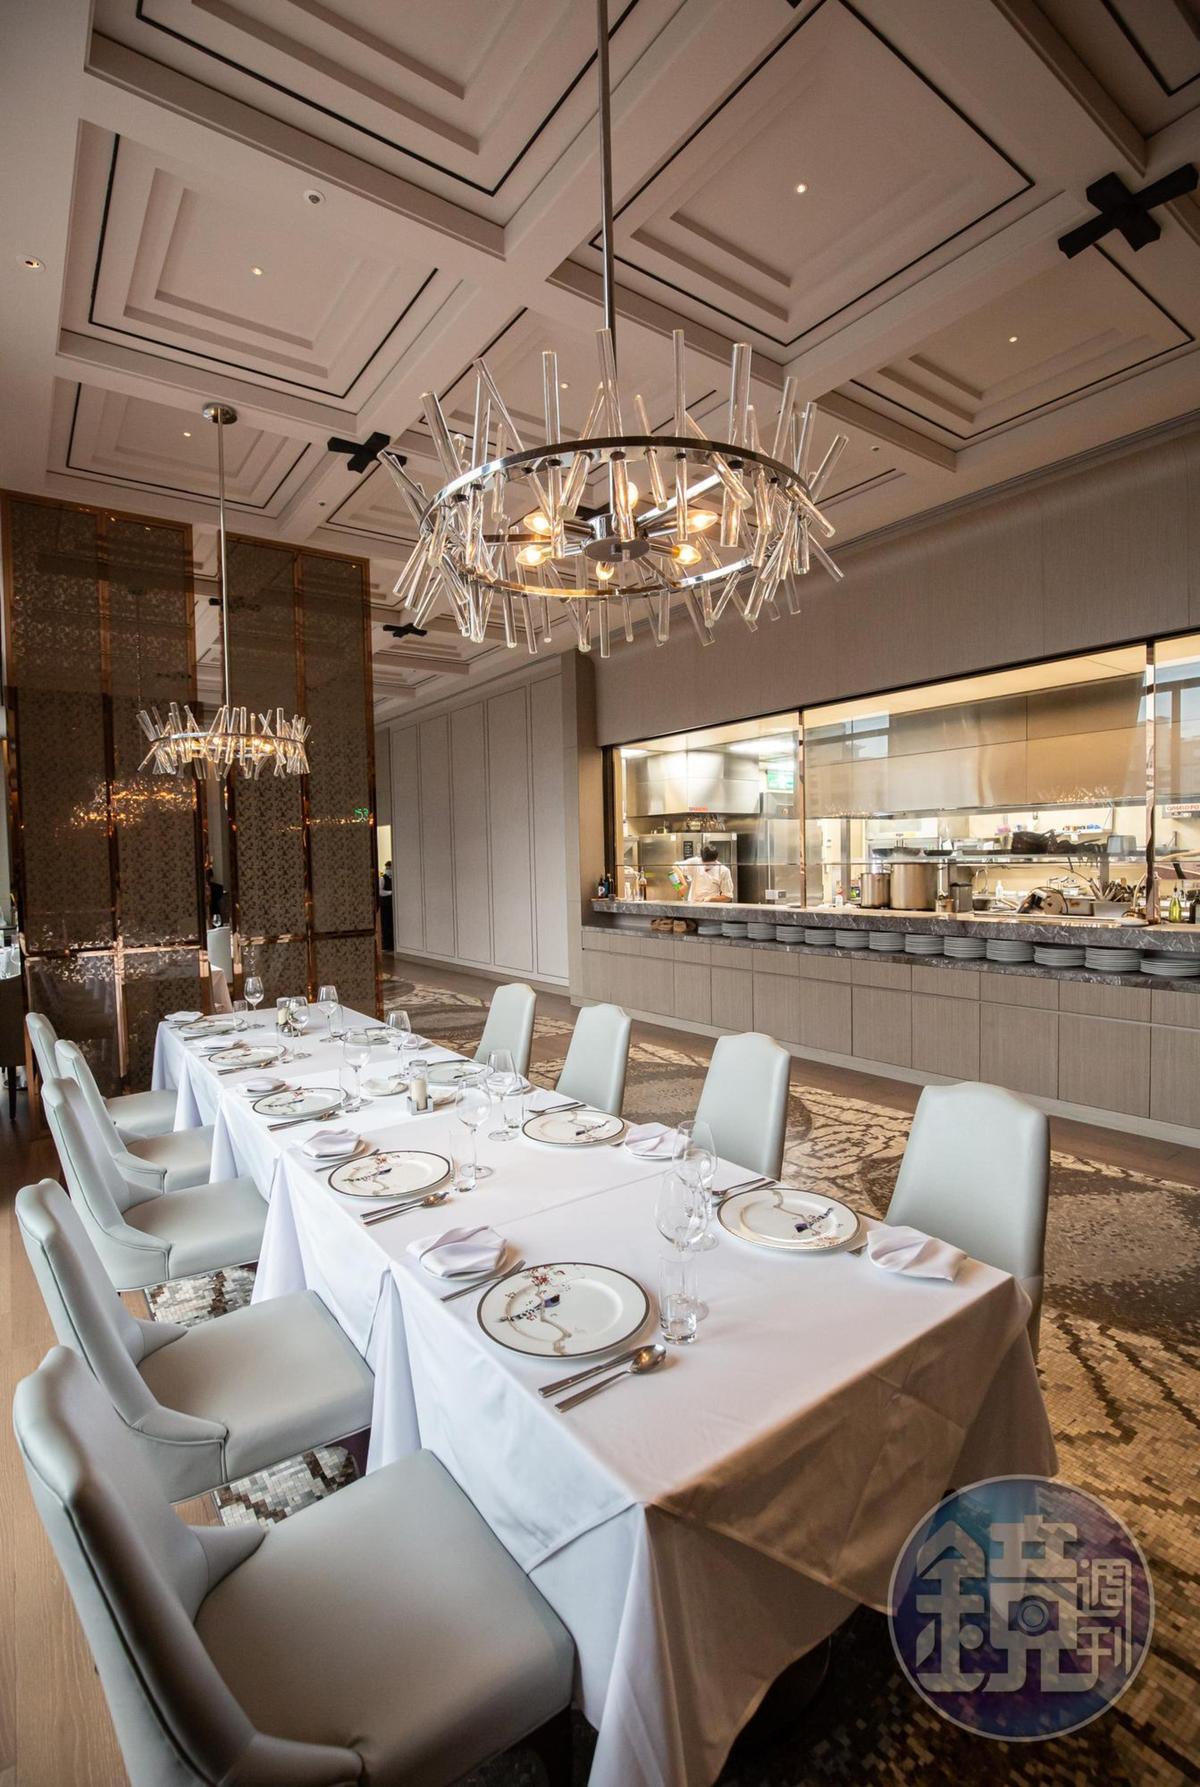 Chef's  Table享有欣賞主廚烹飪的最佳視野。